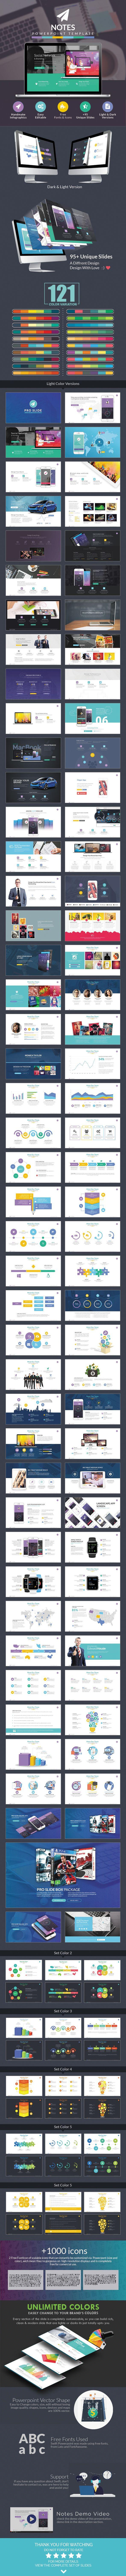 Notes - Business & Webinar Powerpoint Template | Template ...